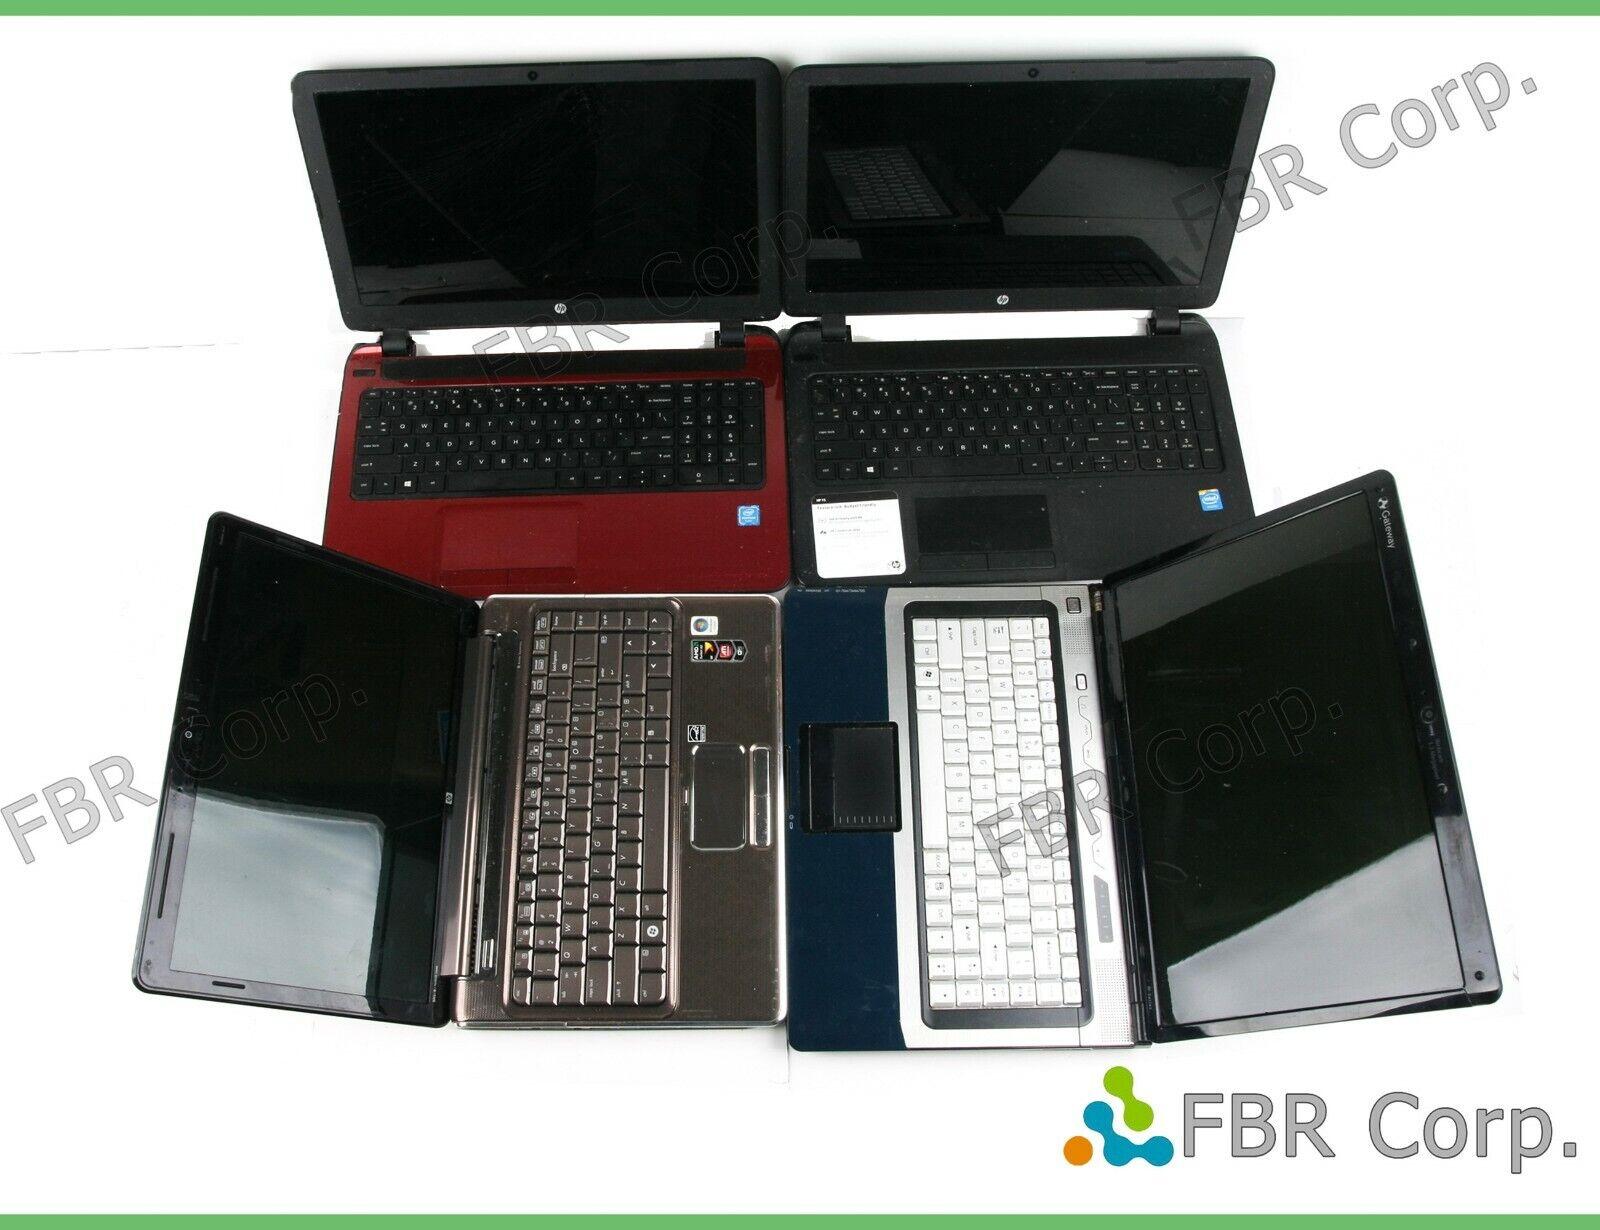 Lot 8 HP Compaq NC440 Pravilion DV4 Presario Gateway SA1 Laptop Parts Repair